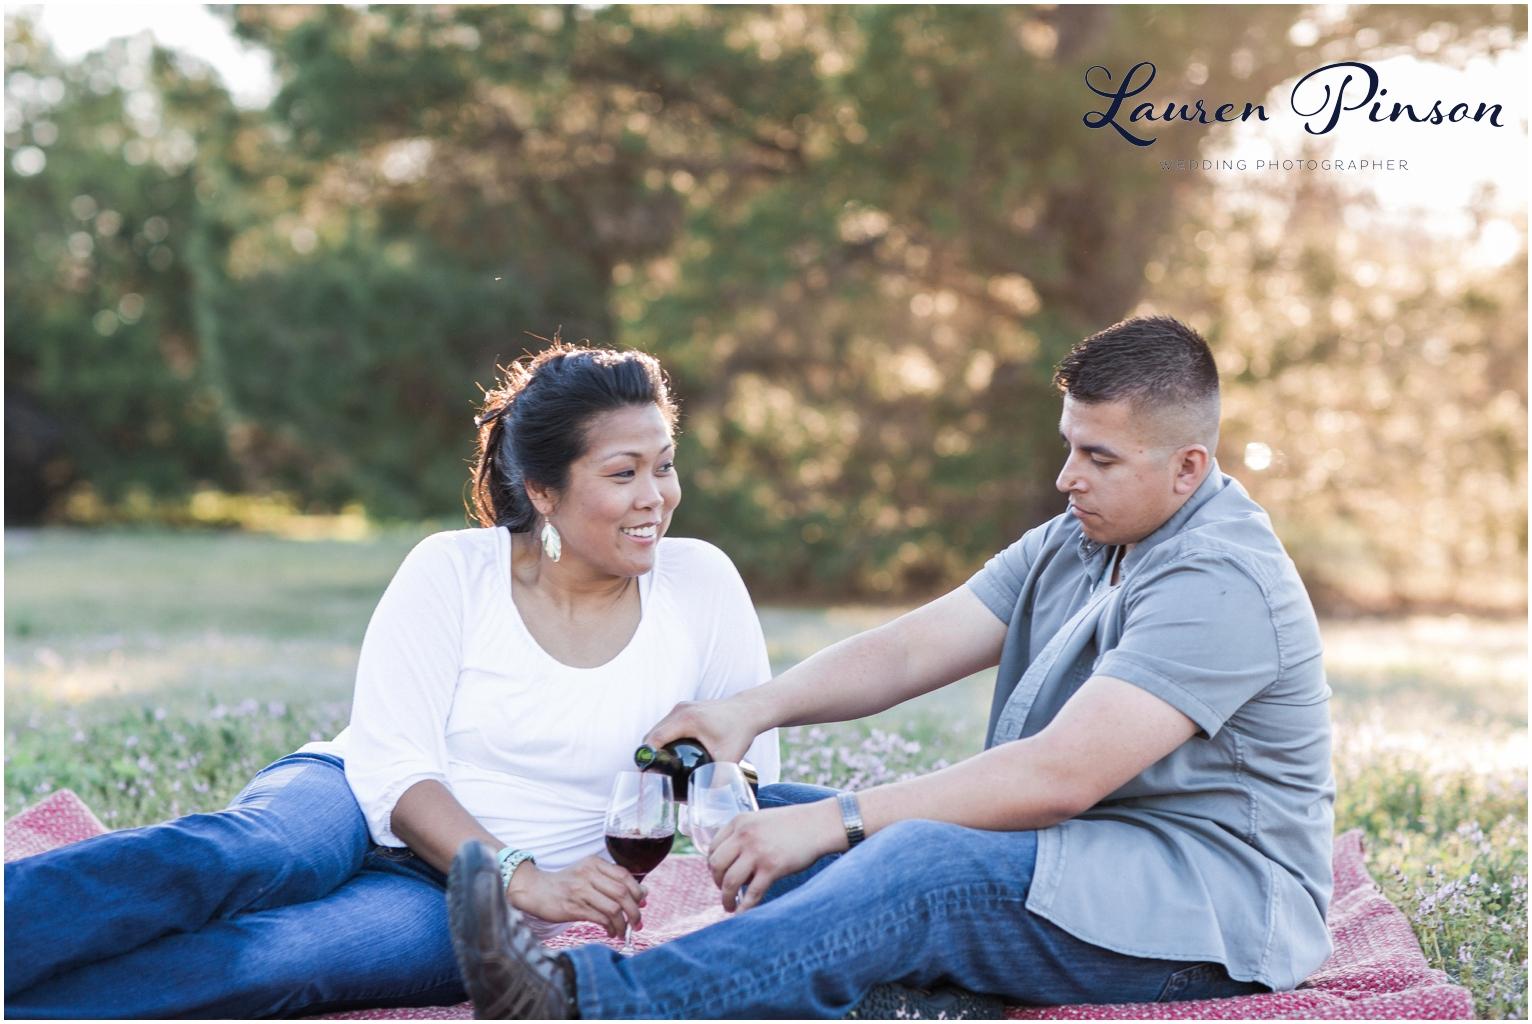 wichita-falls-wedding-photographer-engagement-session-texas-photography-oklahoma-engagement-wedding-photography_0614.jpg